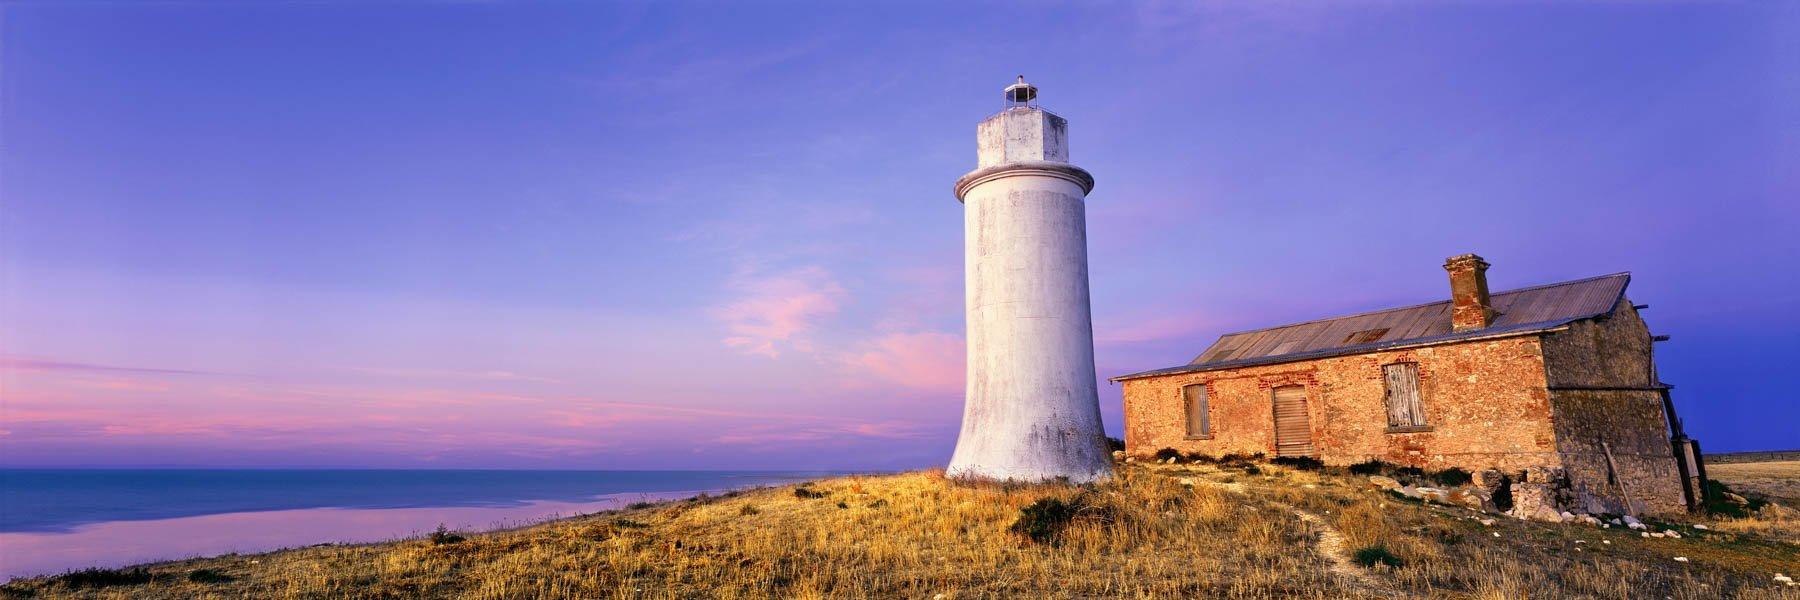 Point Malcolm lighthouse, Lake Alexandrina, SA, Australia.